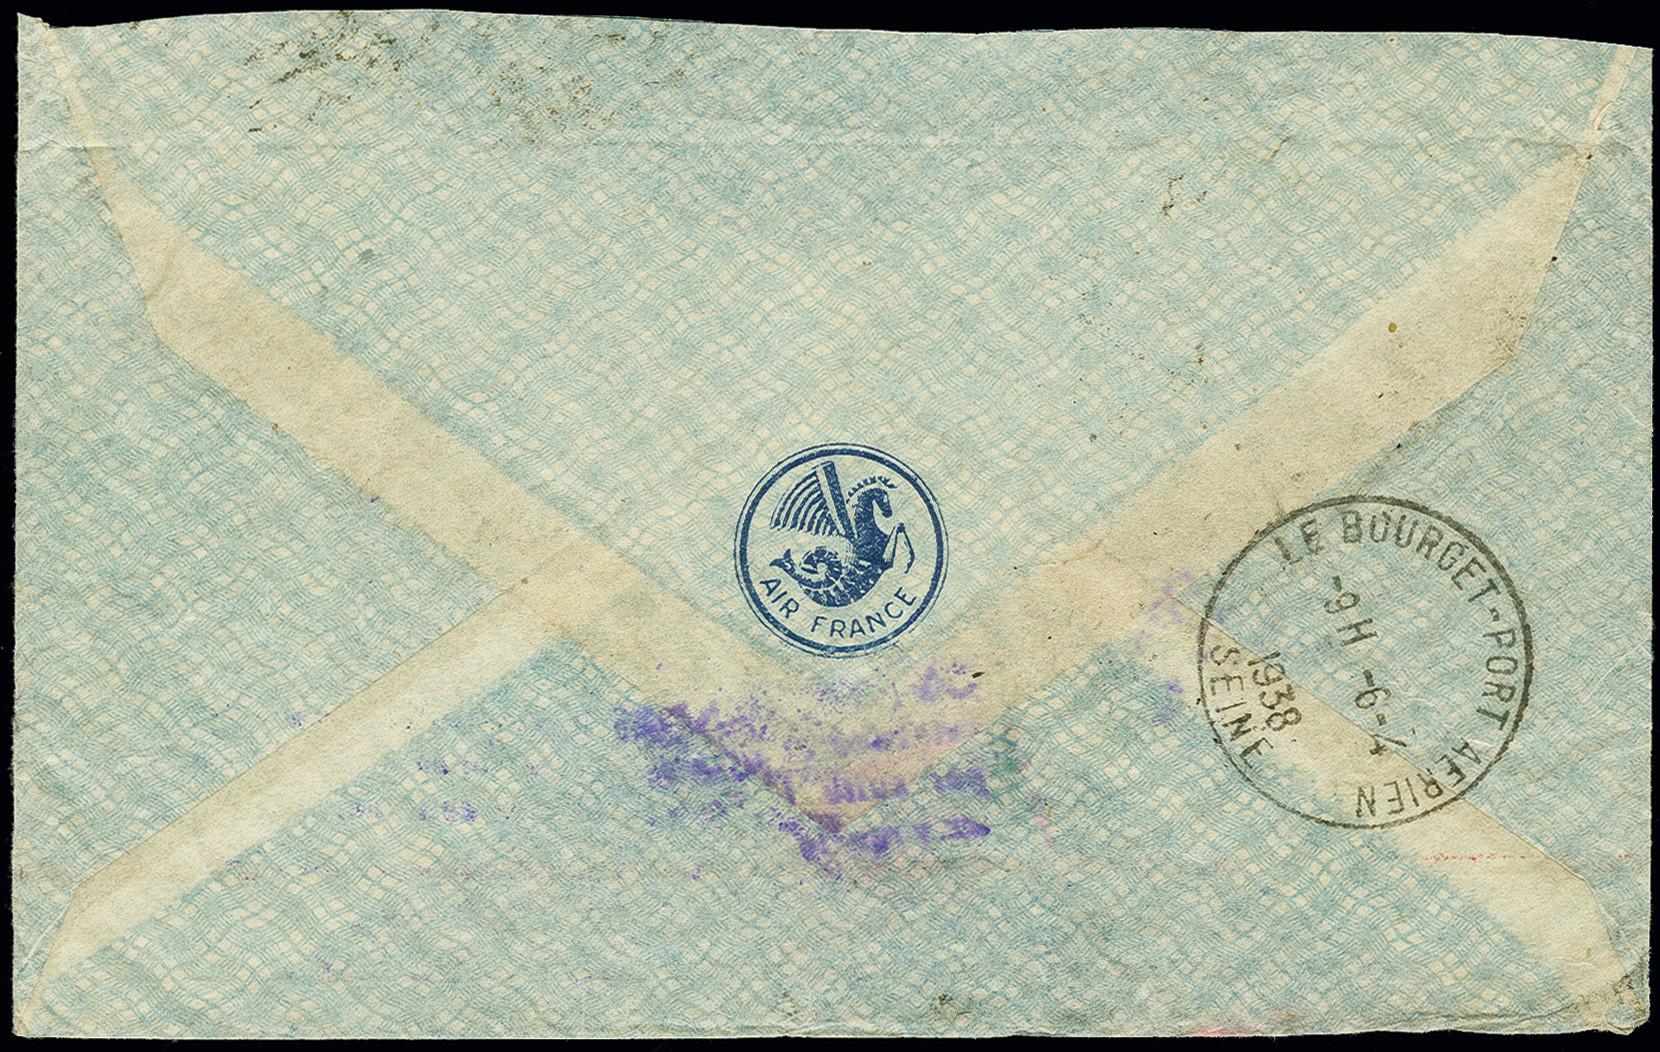 Lot 1151 - airmail foreign airmail -  Heinrich Koehler Auktionen Auction #368- Day 2